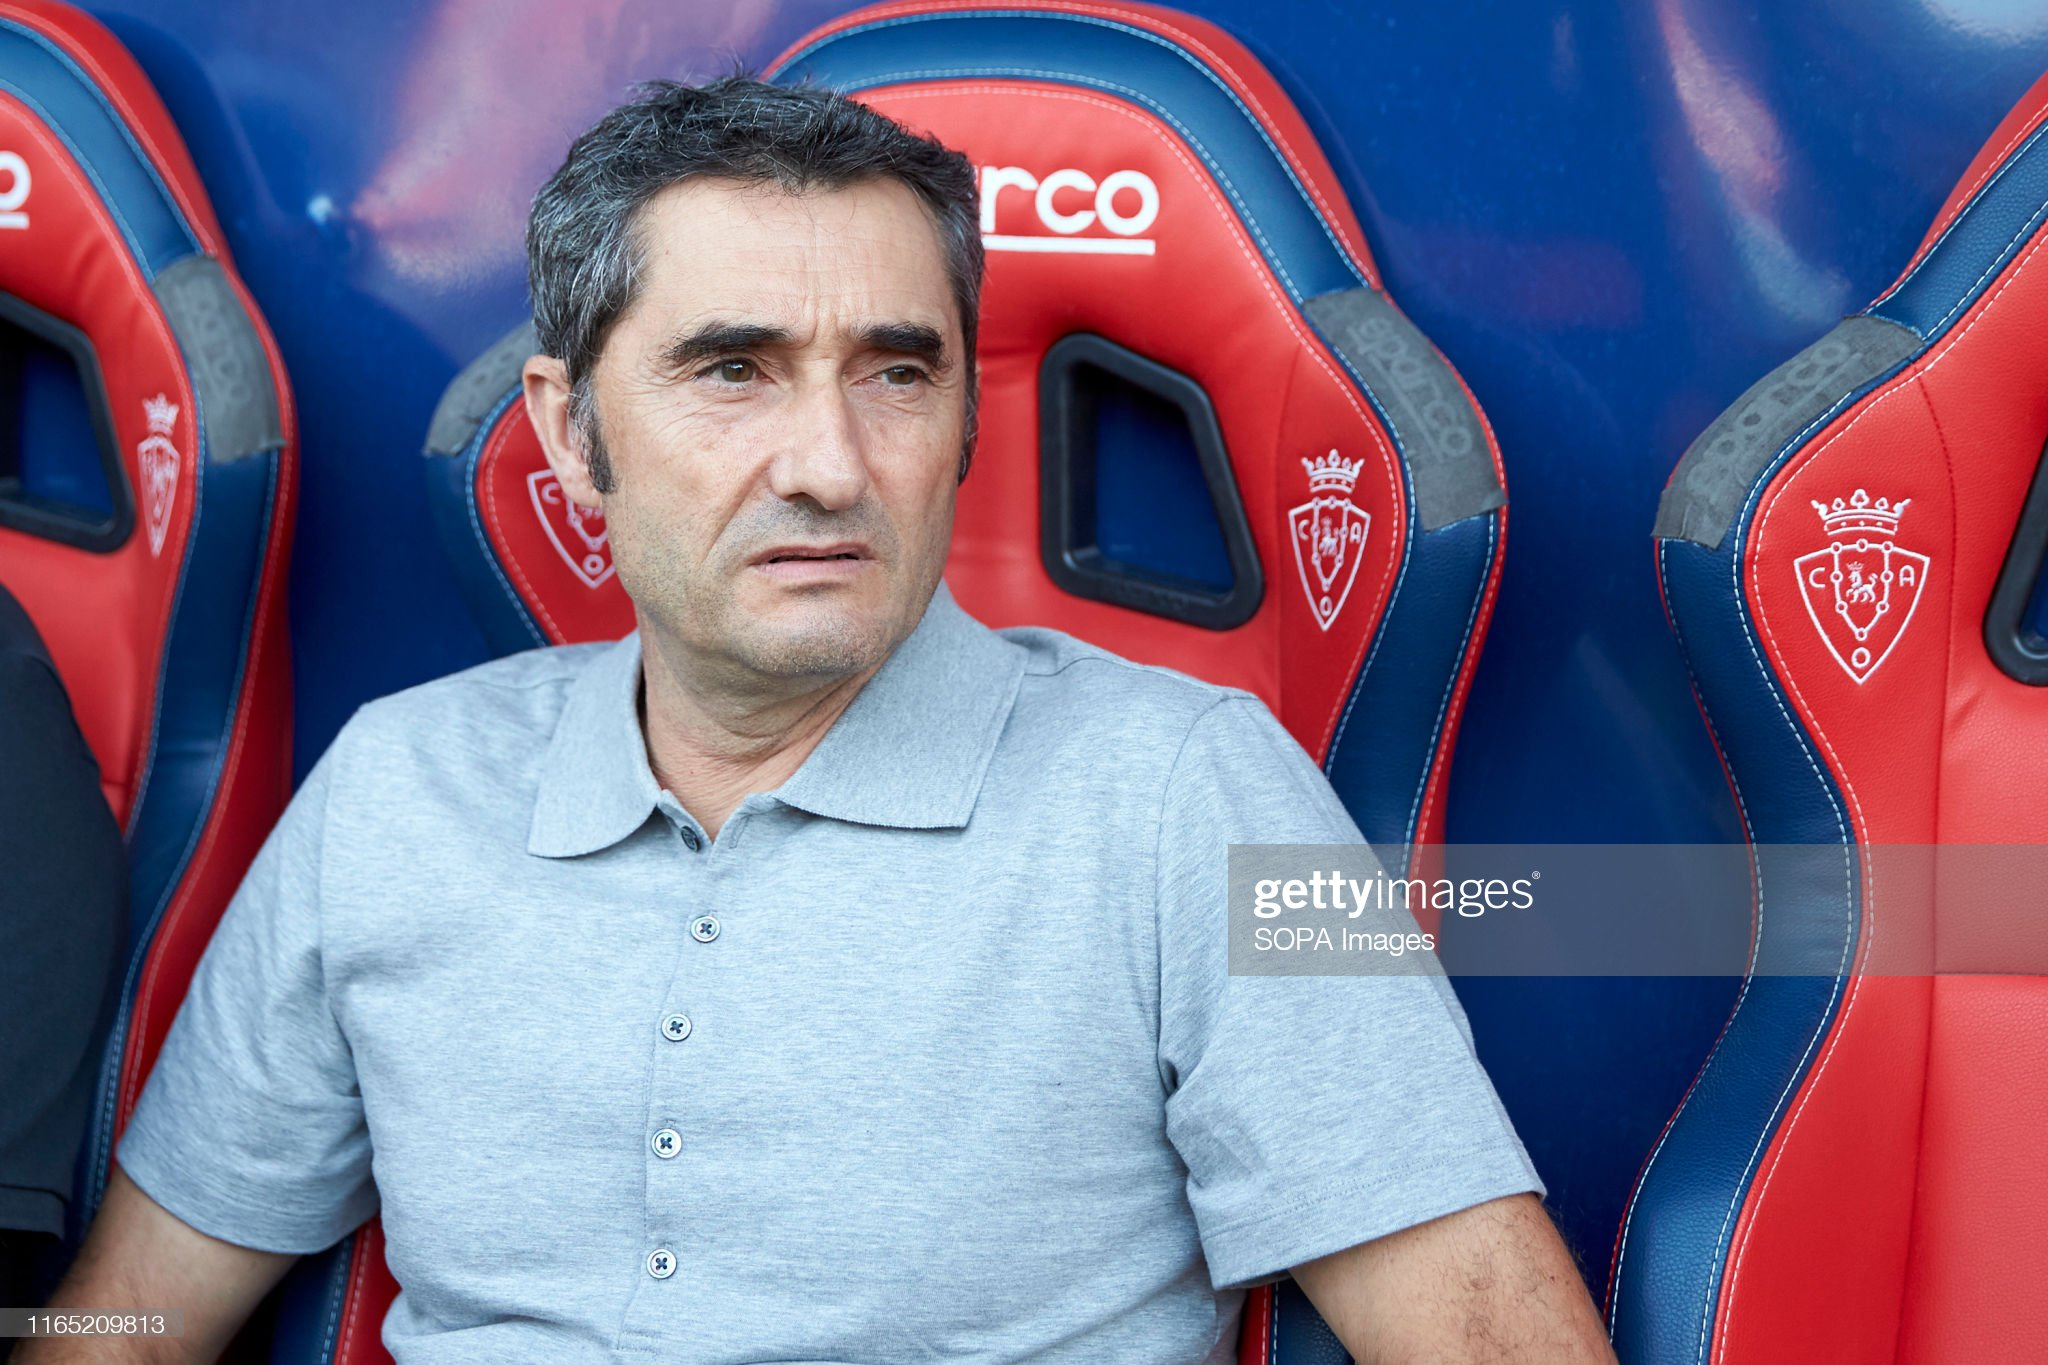 صور مباراة : أوساسونا - برشلونة 2-2 ( 31-08-2019 )  Ernesto-valverde-after-the-spanish-la-liga-santander-match-between-ca-picture-id1165209813?s=2048x2048